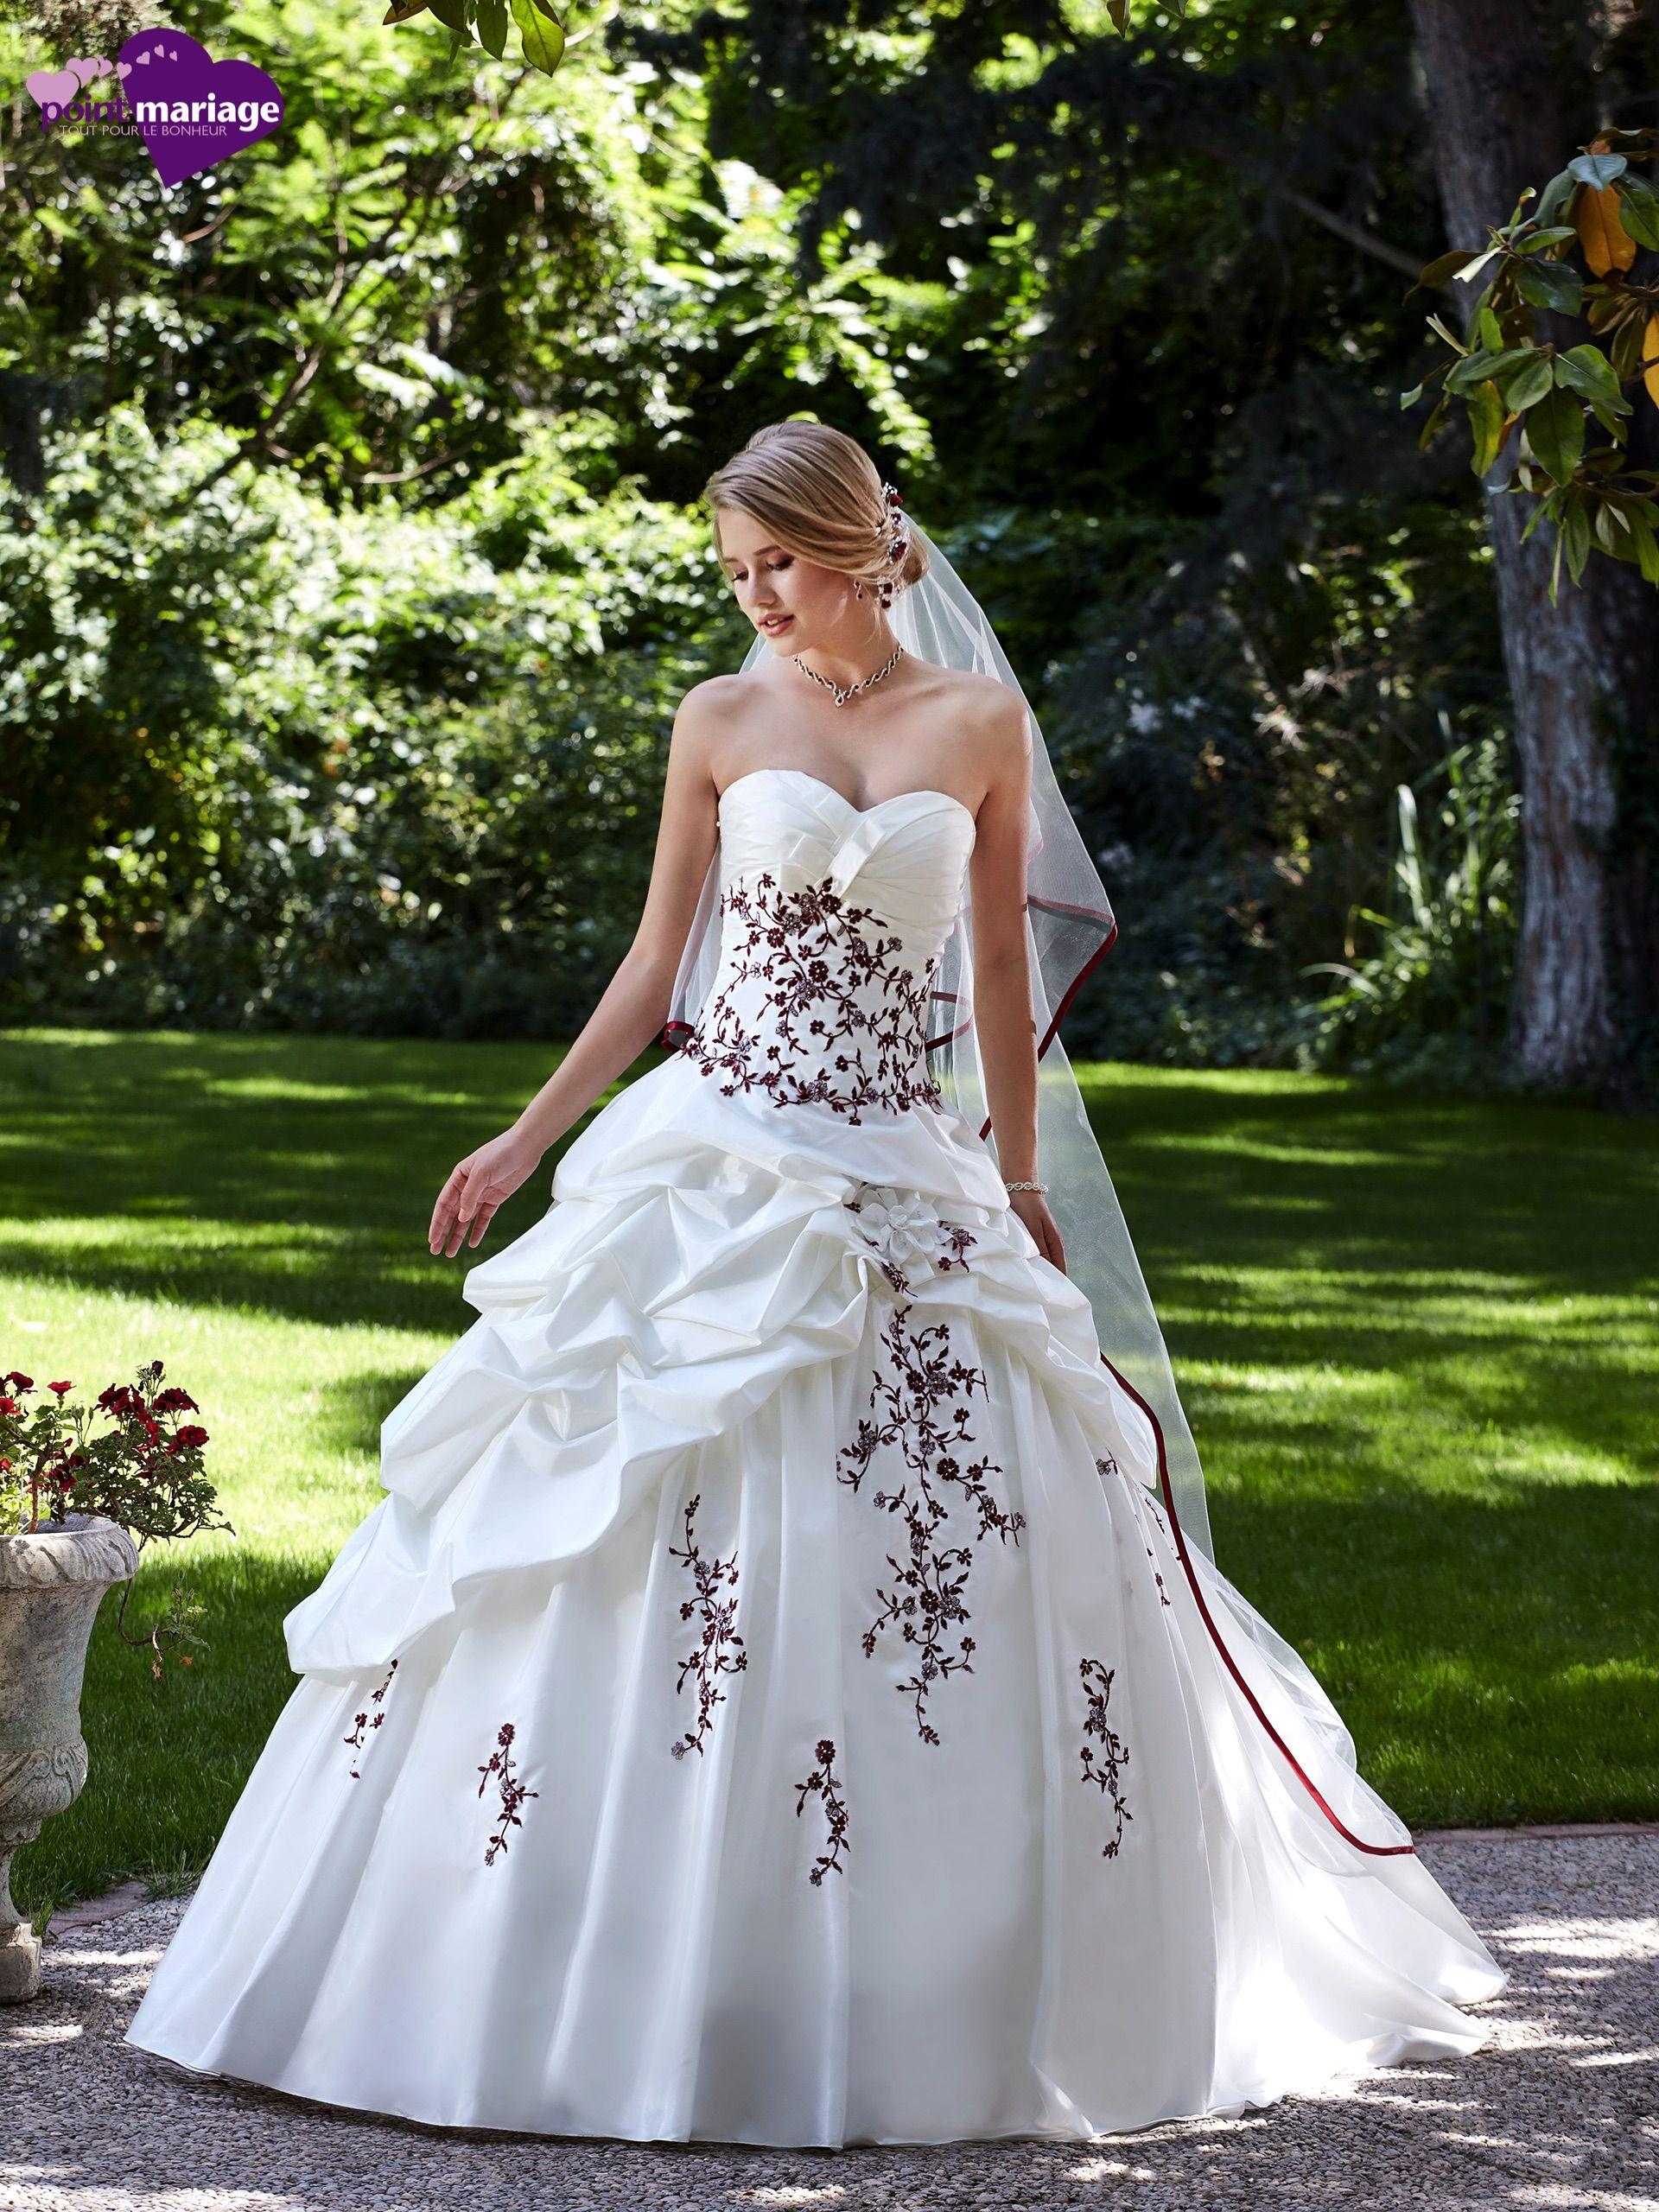 Robe de mariee bordeaux prix